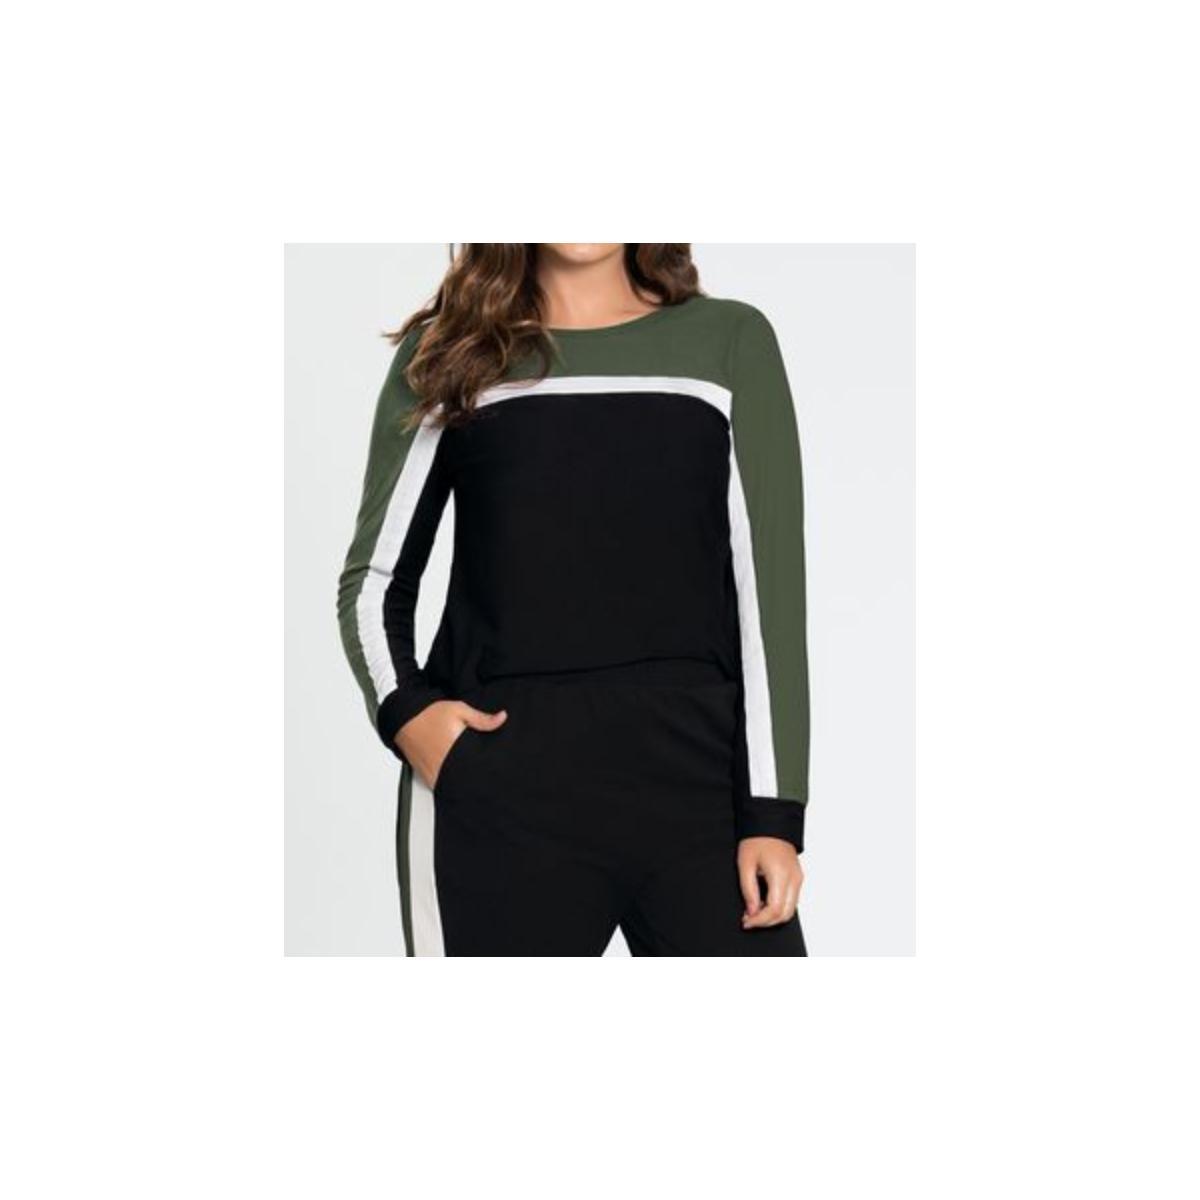 Blusa Feminina Lunender 60174 Verde/preto